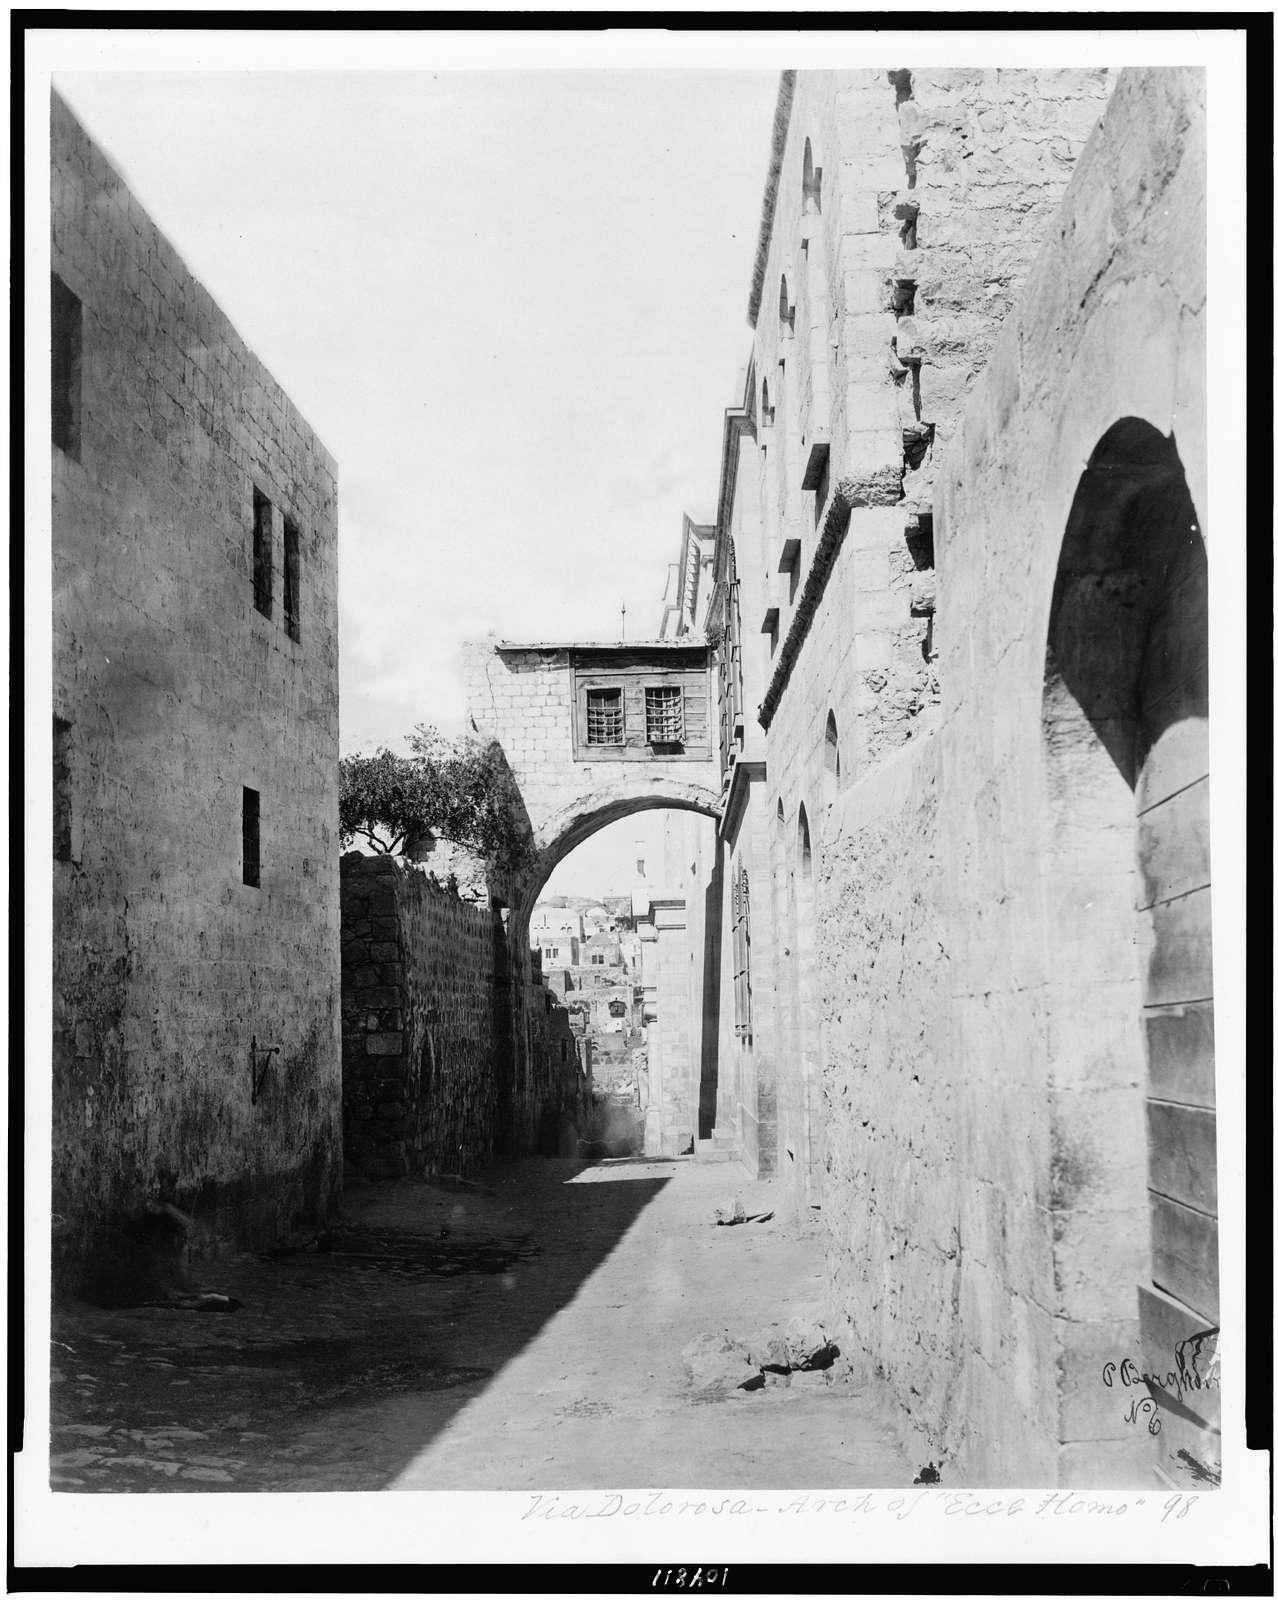 "[Via Dolorosa - arch of ""Ecce Homo""] / P. Bergheim."